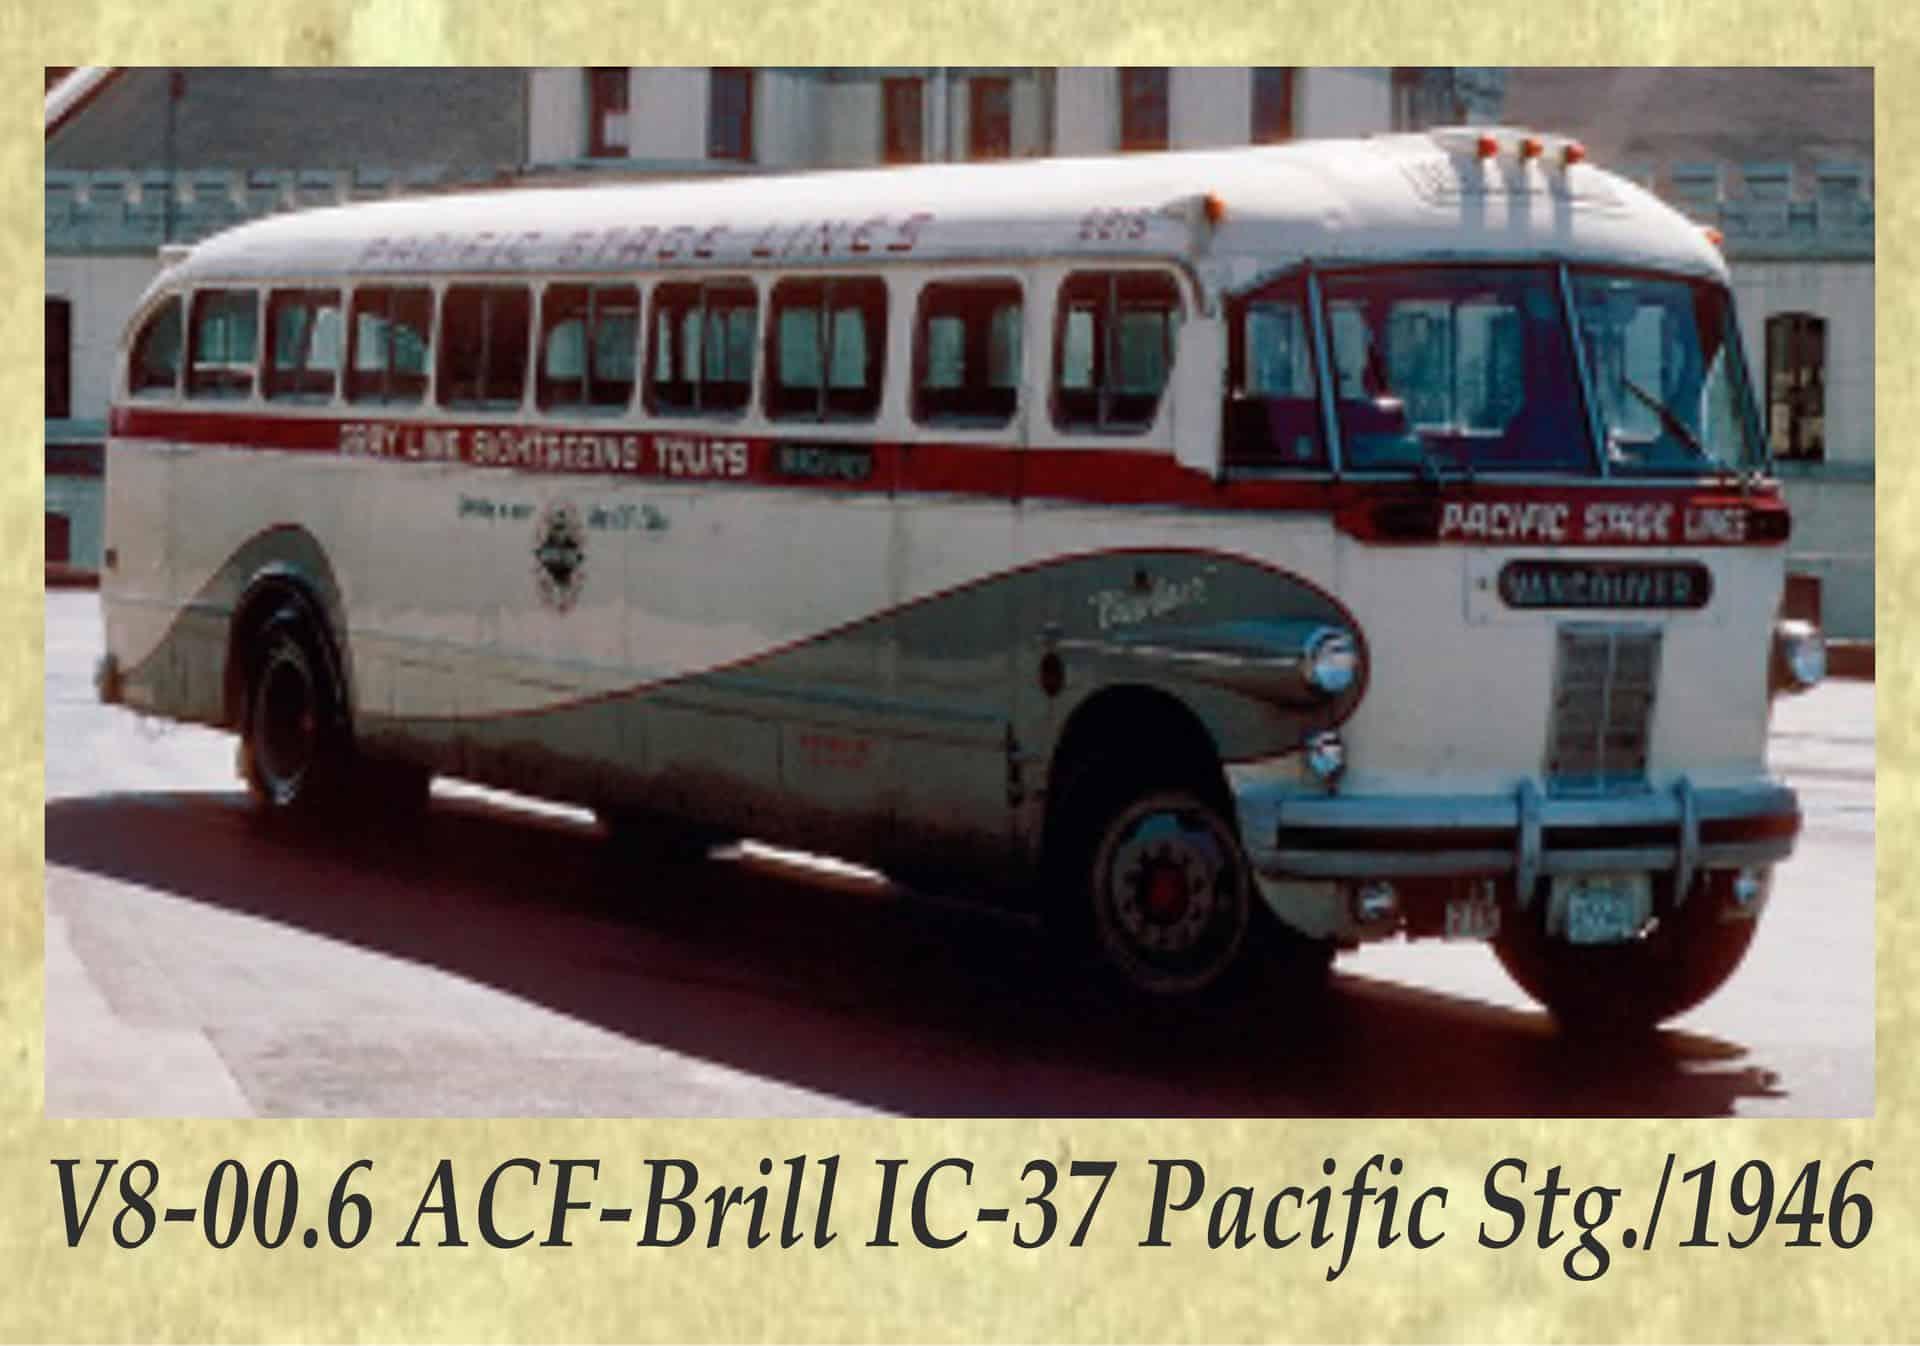 V8-00.6 ACF-Brill IC-37 Pacific Stg._1946